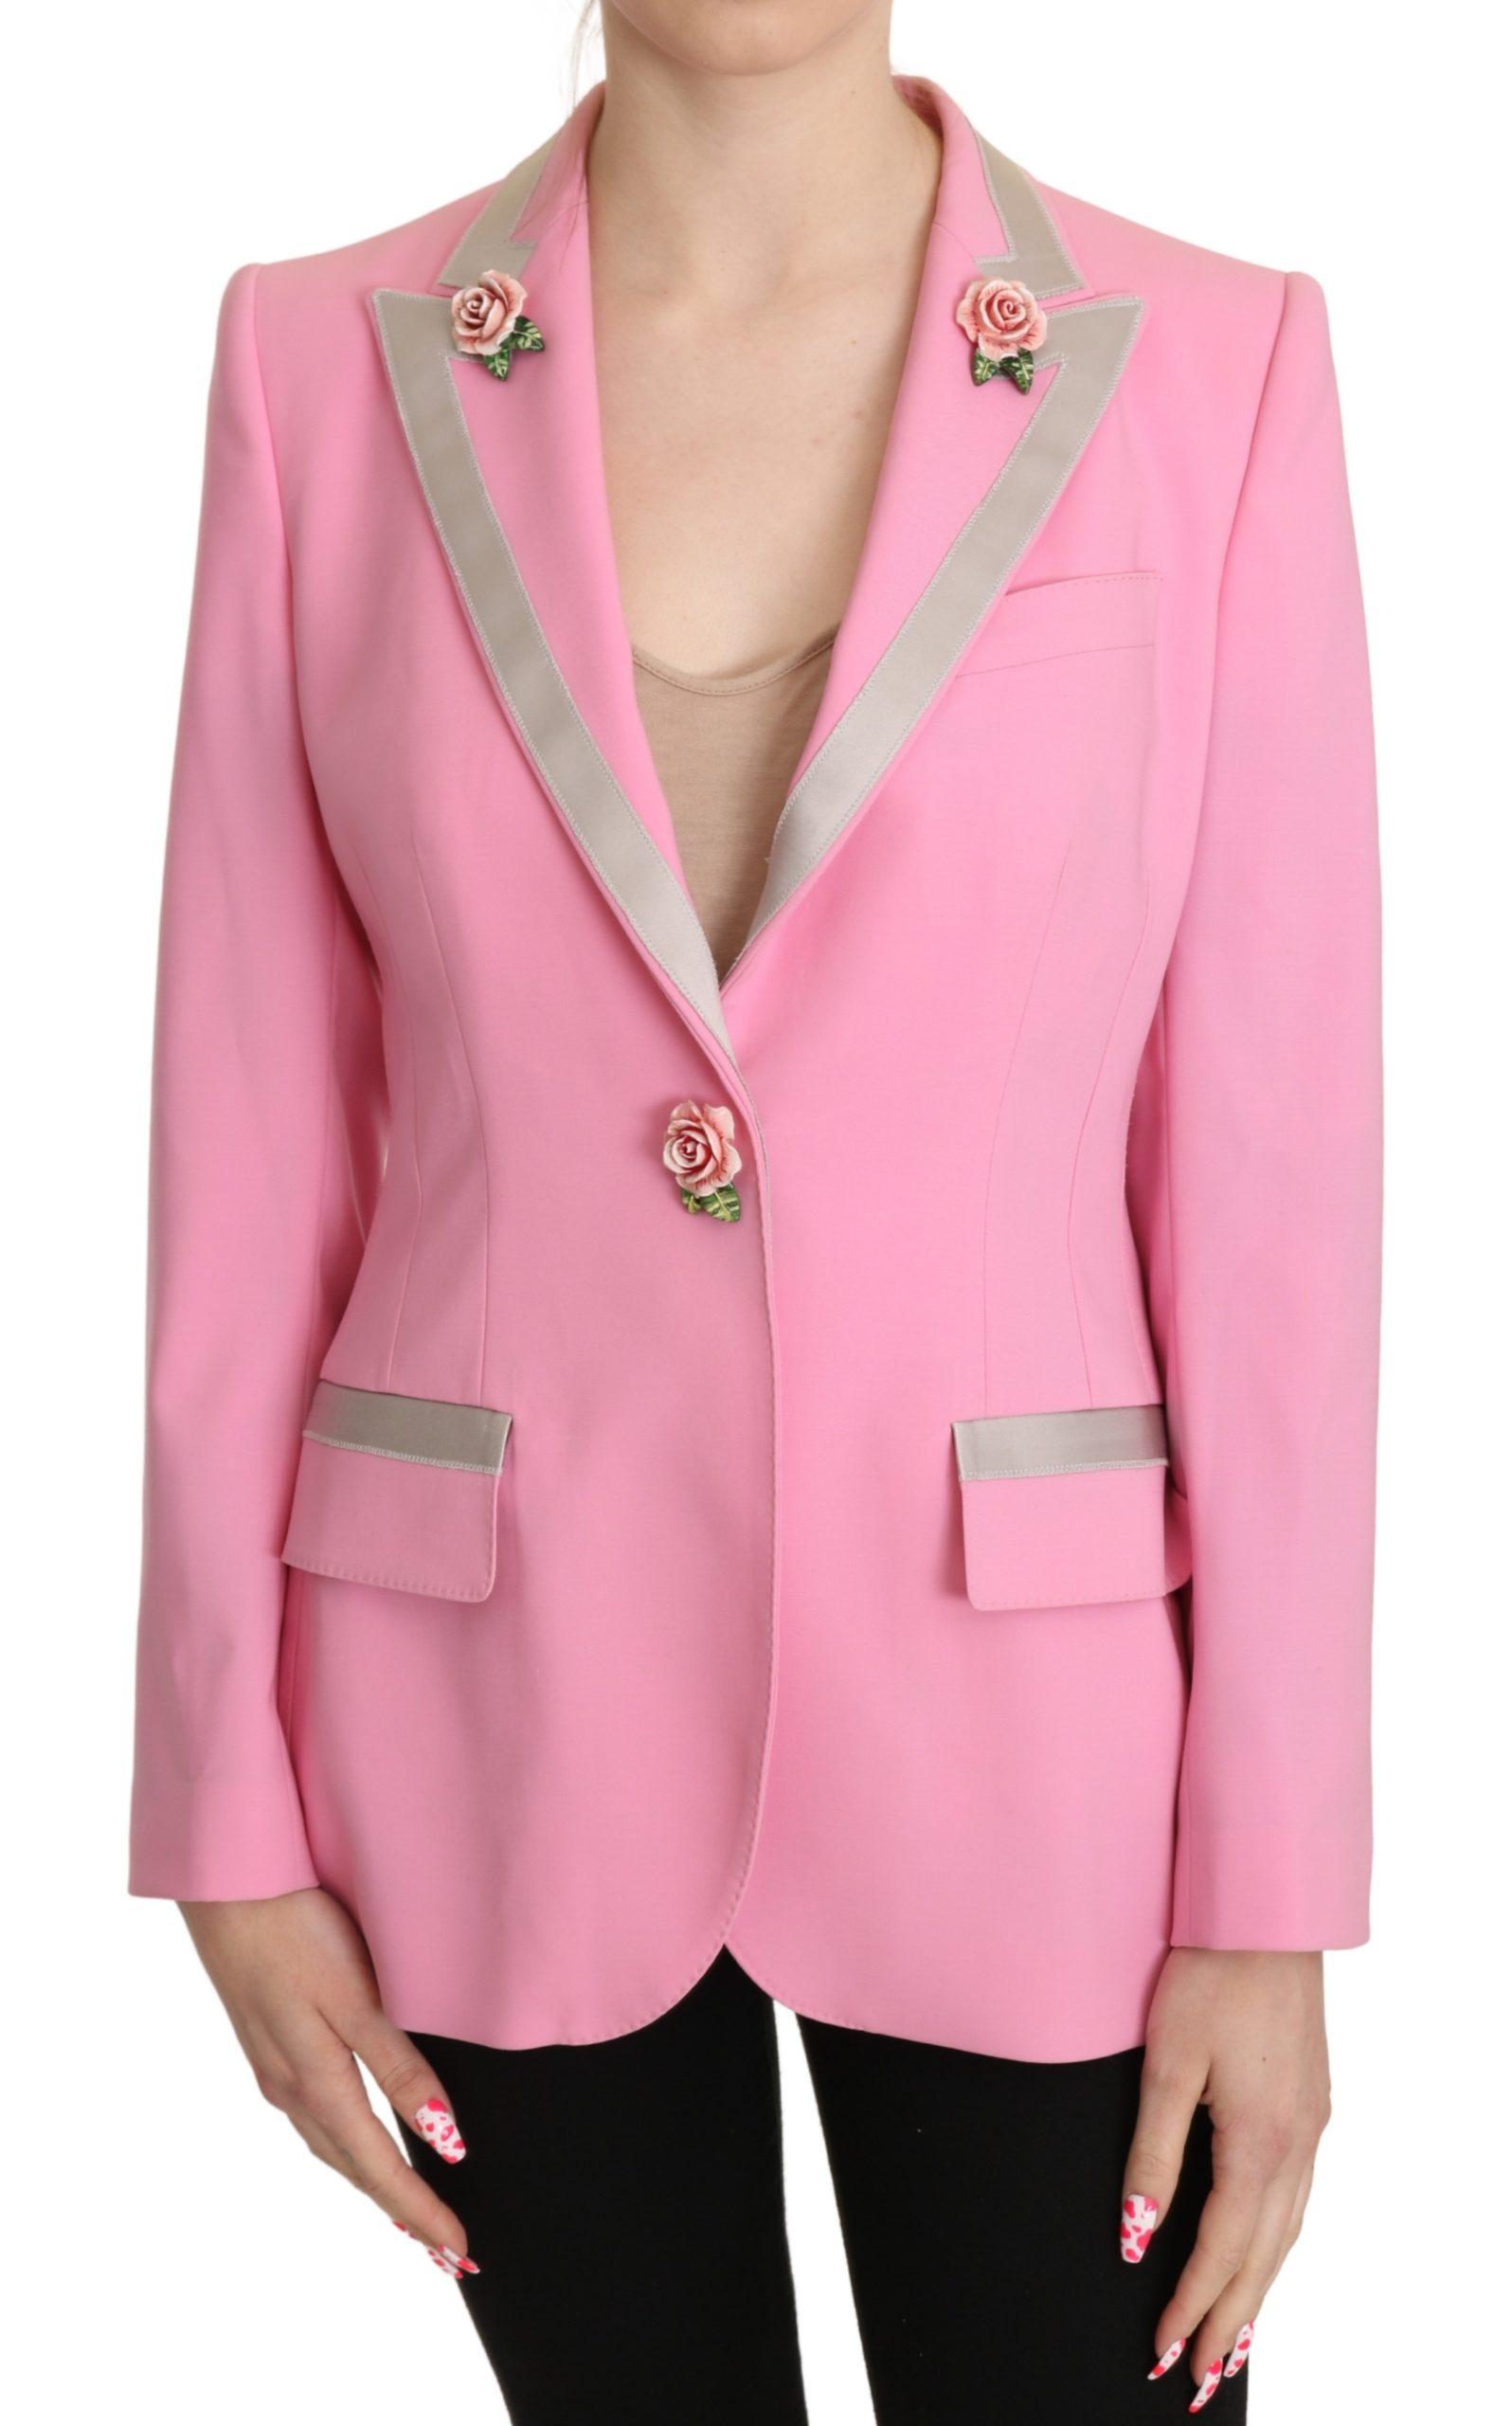 Dolce & Gabbana Women's Roses Single Breasted Jacket Pink KOS1817 - IT42 M